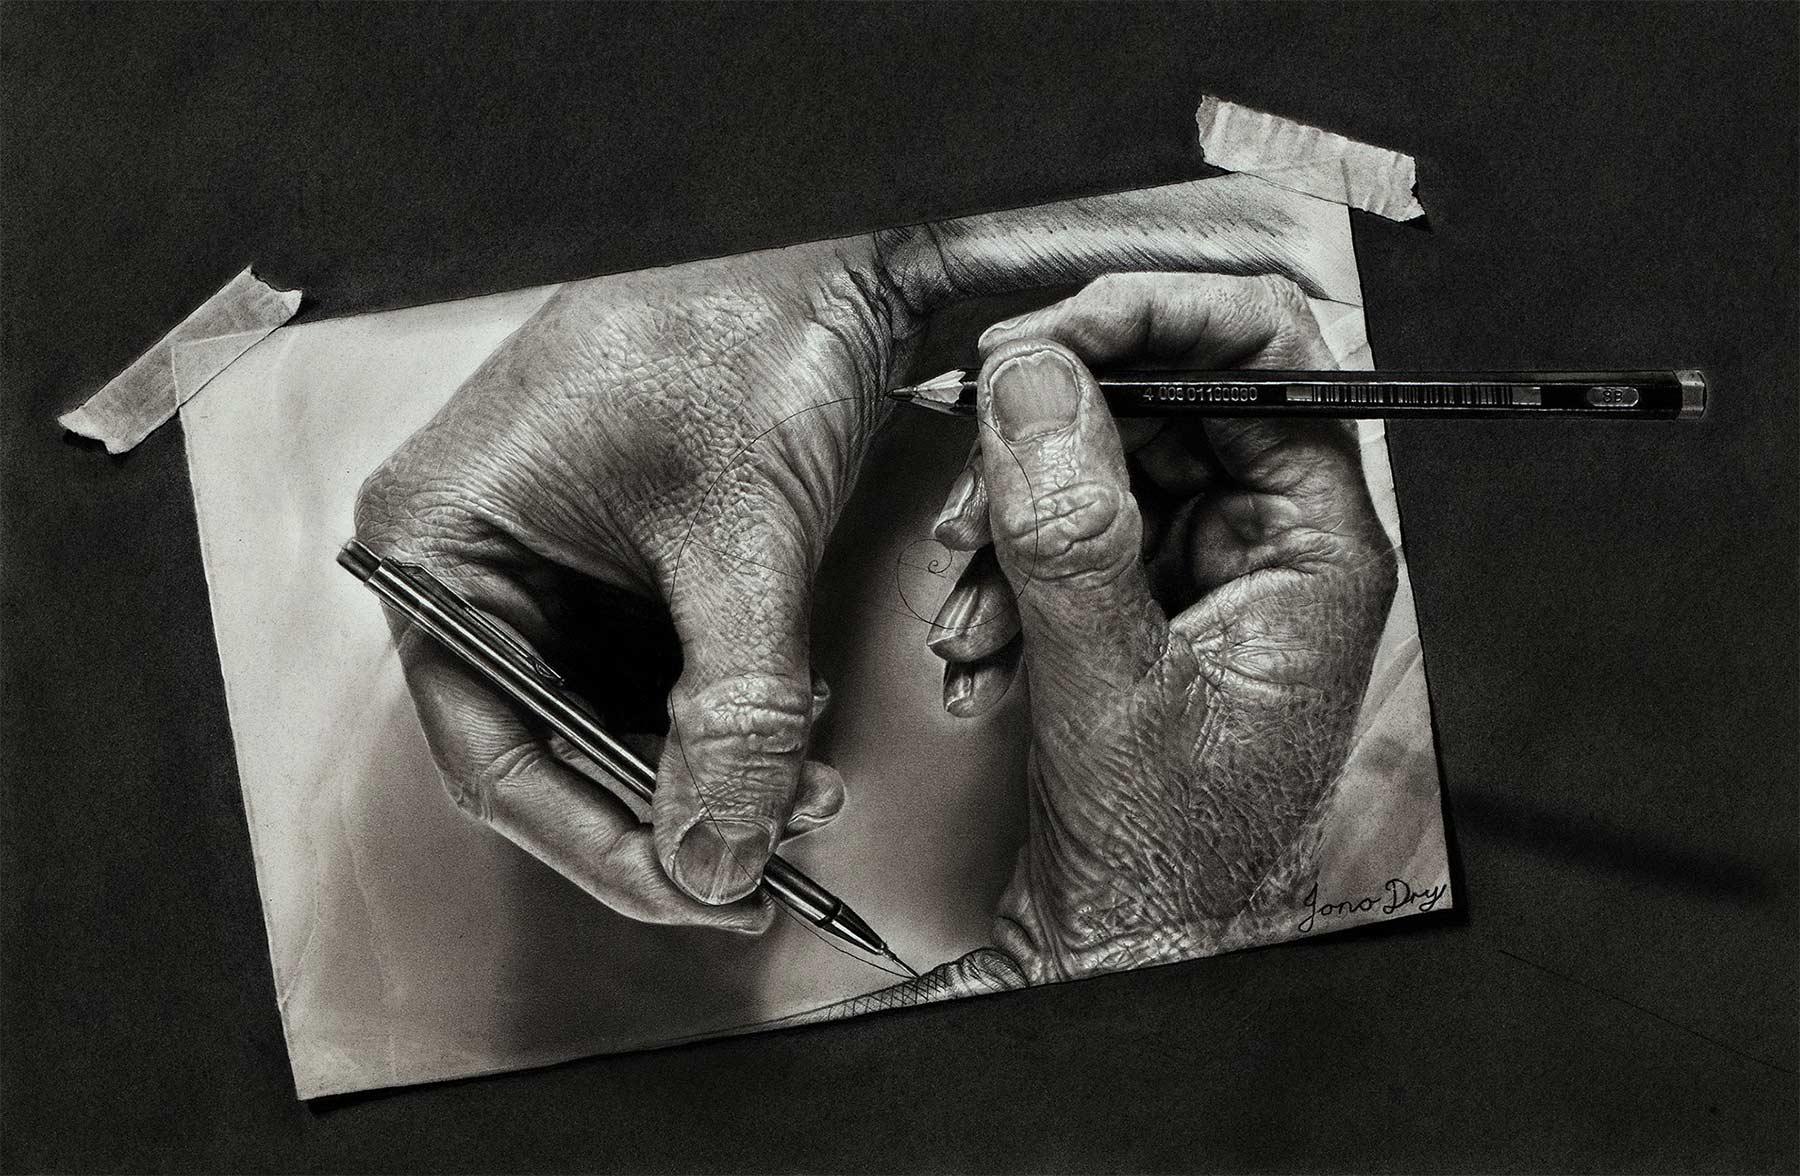 Zeichnungen: Jono Dry Zeichnungen-Jono-Dry_01